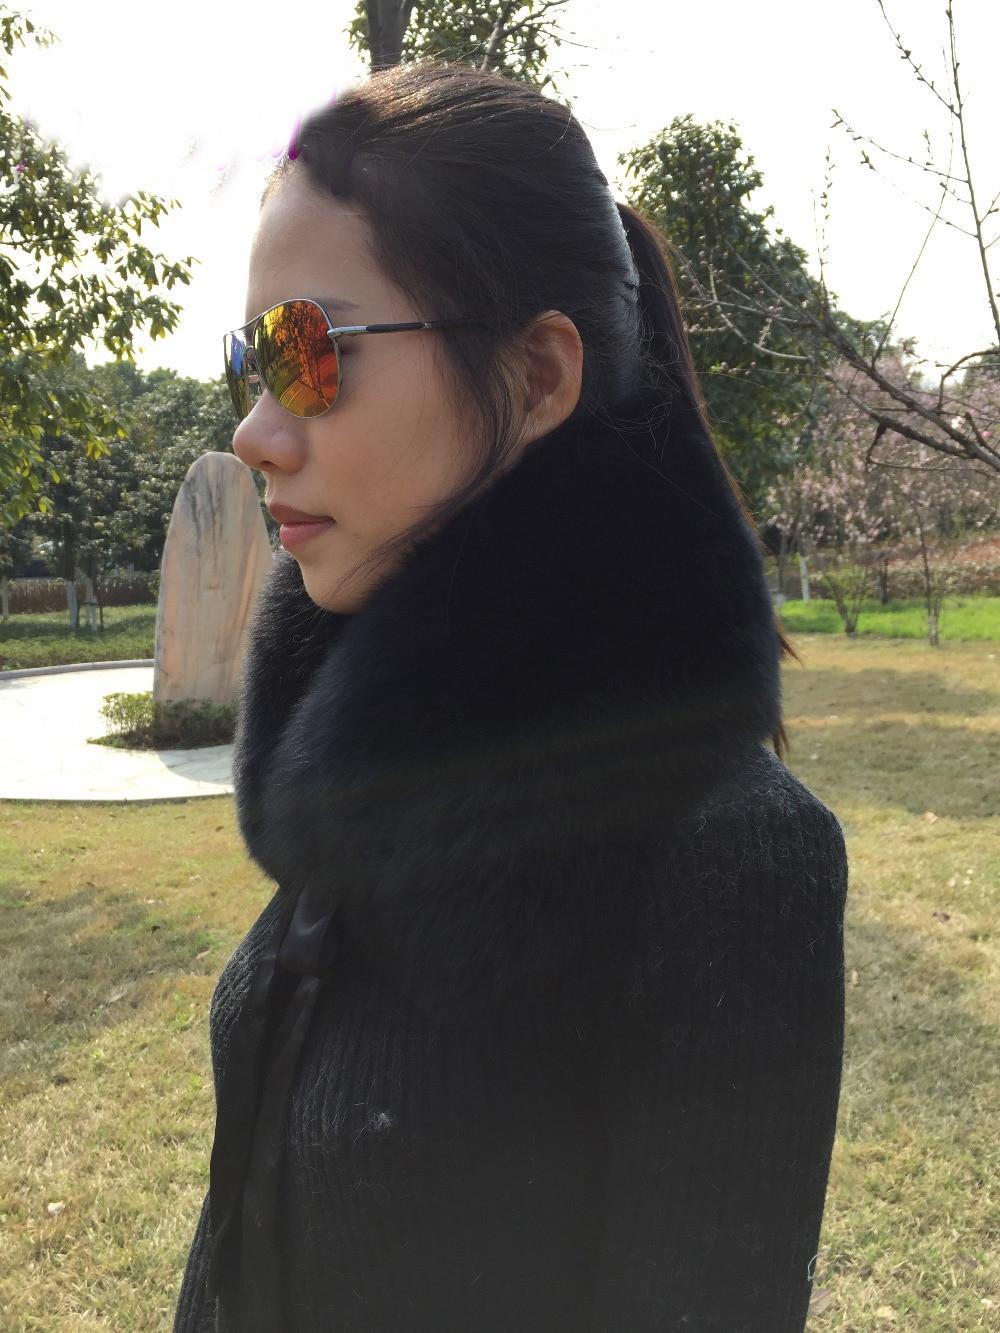 MLHXFUR 100% Real Women Fox Fur Collar Scarf Genuine Men Fur Collars Scarves Neckwarmer Girls Boys Black Fur with Ribbon